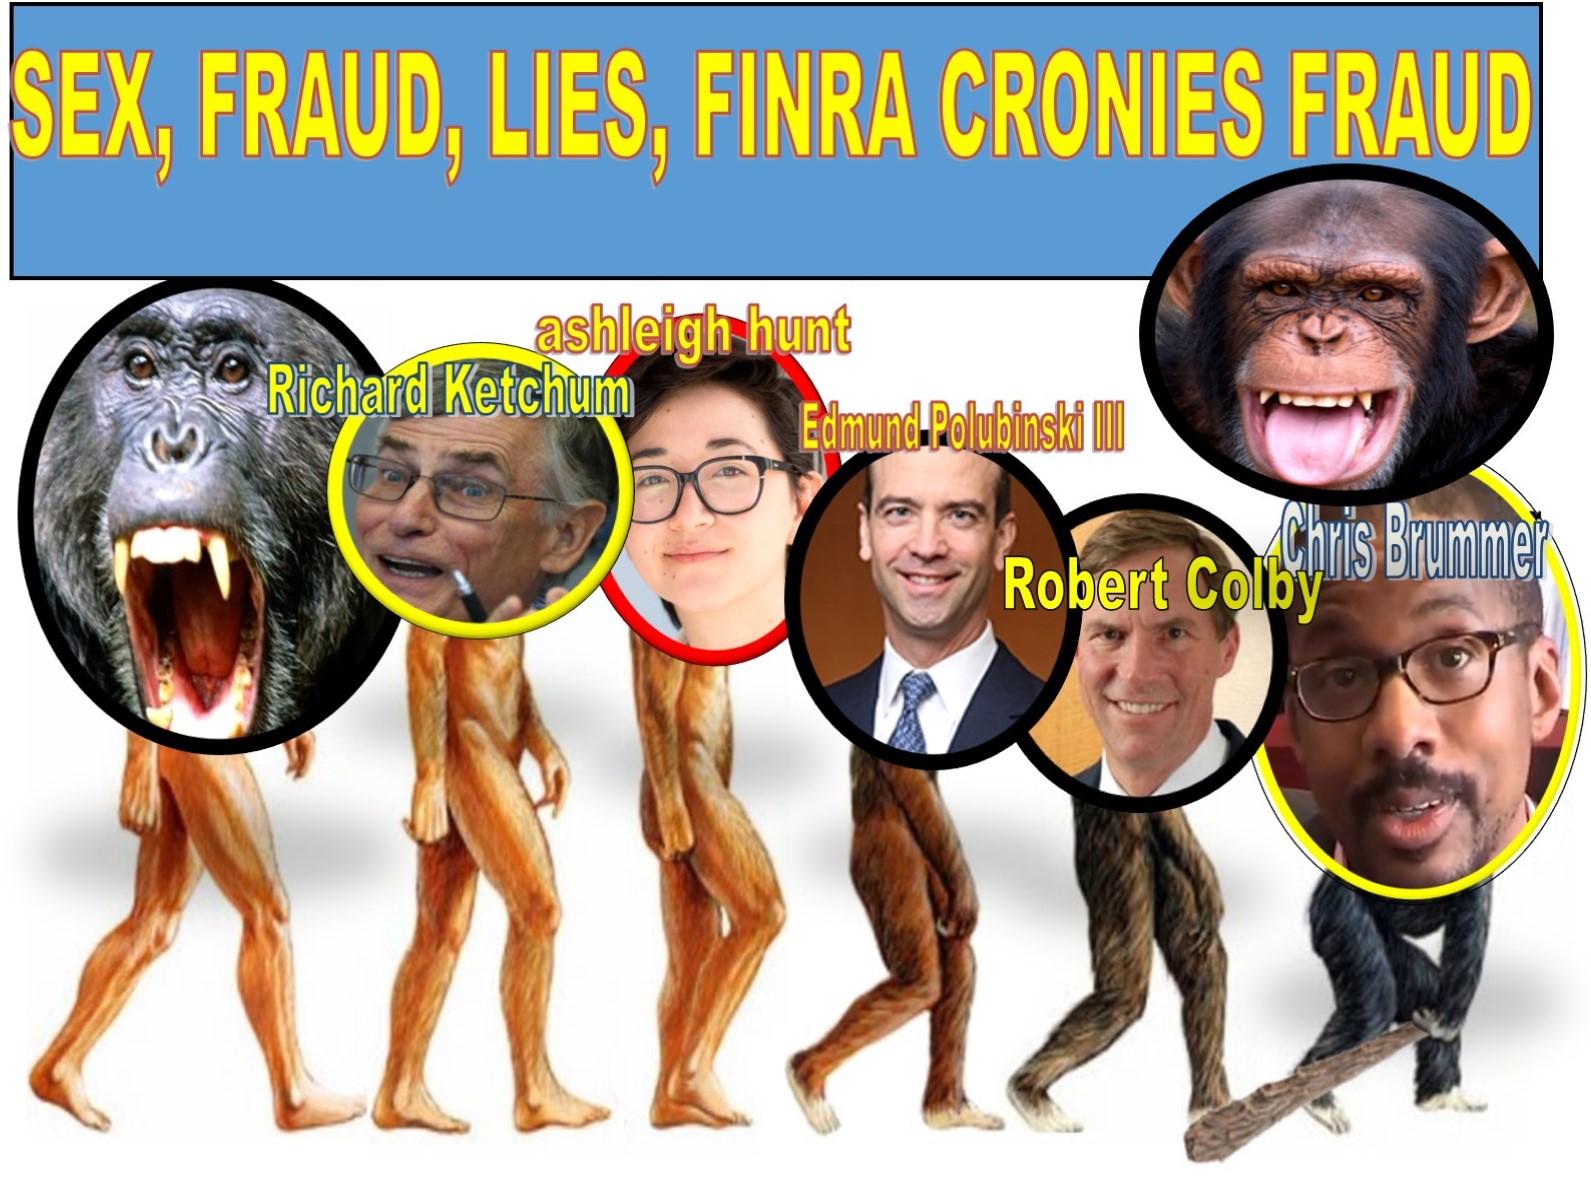 Edmund Polubinski III, Davis Polk, Chris Brummer, FINRA NAC, Robert Colby, Richard Ketchum, Michael Garawski, Alan Lawhead, Nicole Gueron, AshleIgh Hunt, fraud